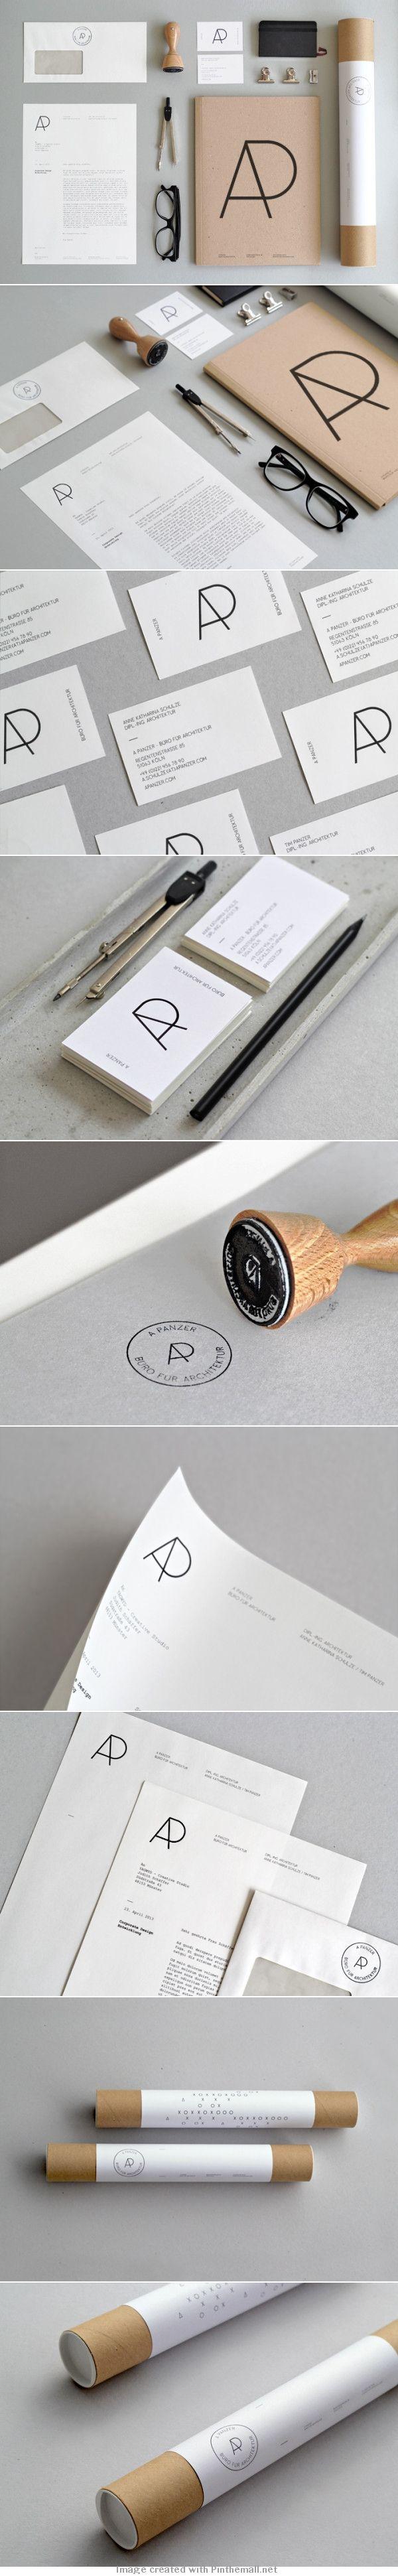 logo corporate branding visual graphic identity kraft paper design business card label black white print sticker minimal stamp